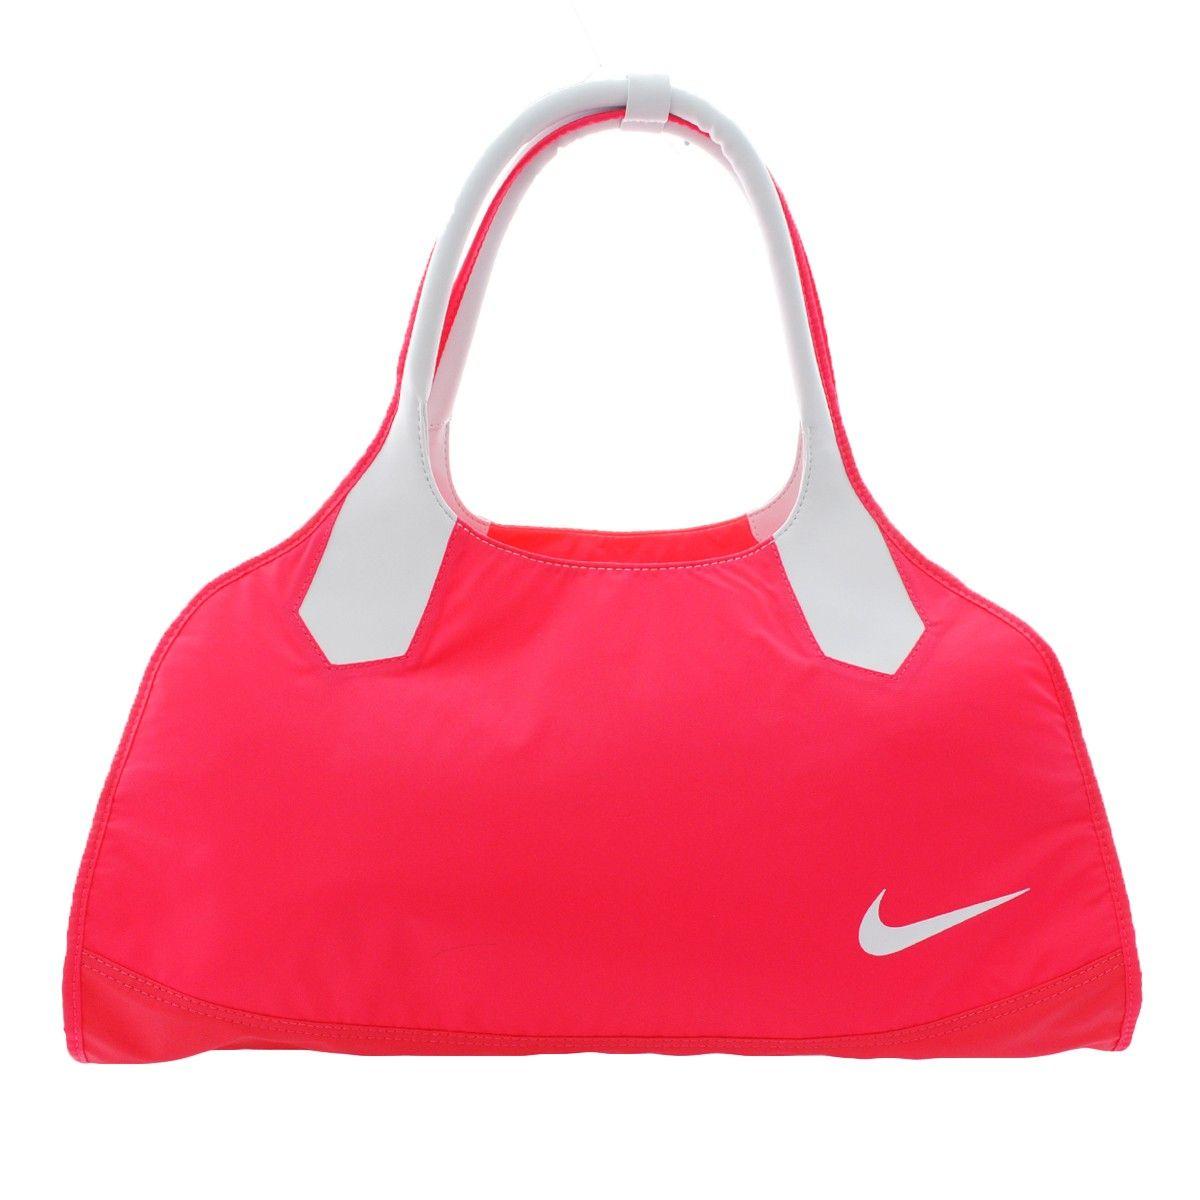 42a26c822df88 Bolsa Nike Feminina en 2019 | Compras eua | Bolsas nike, Nike y Bolsas